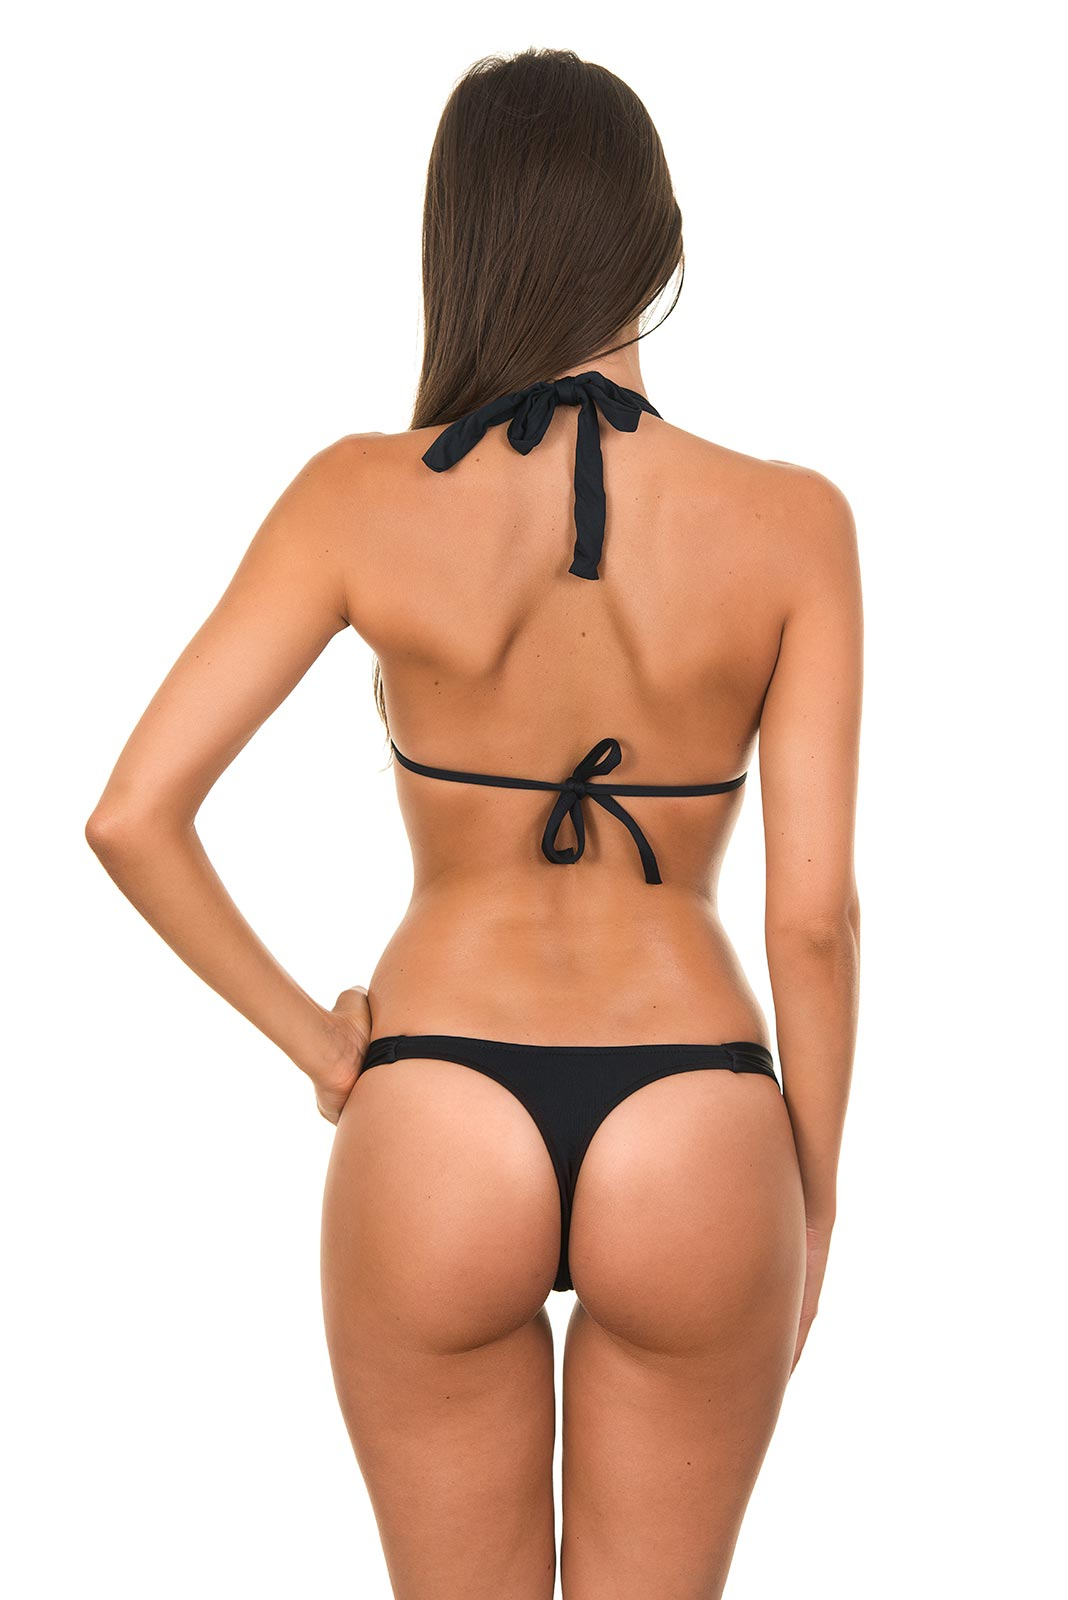 Bikini String Tanga in schwarz, RIO - mixkinicom